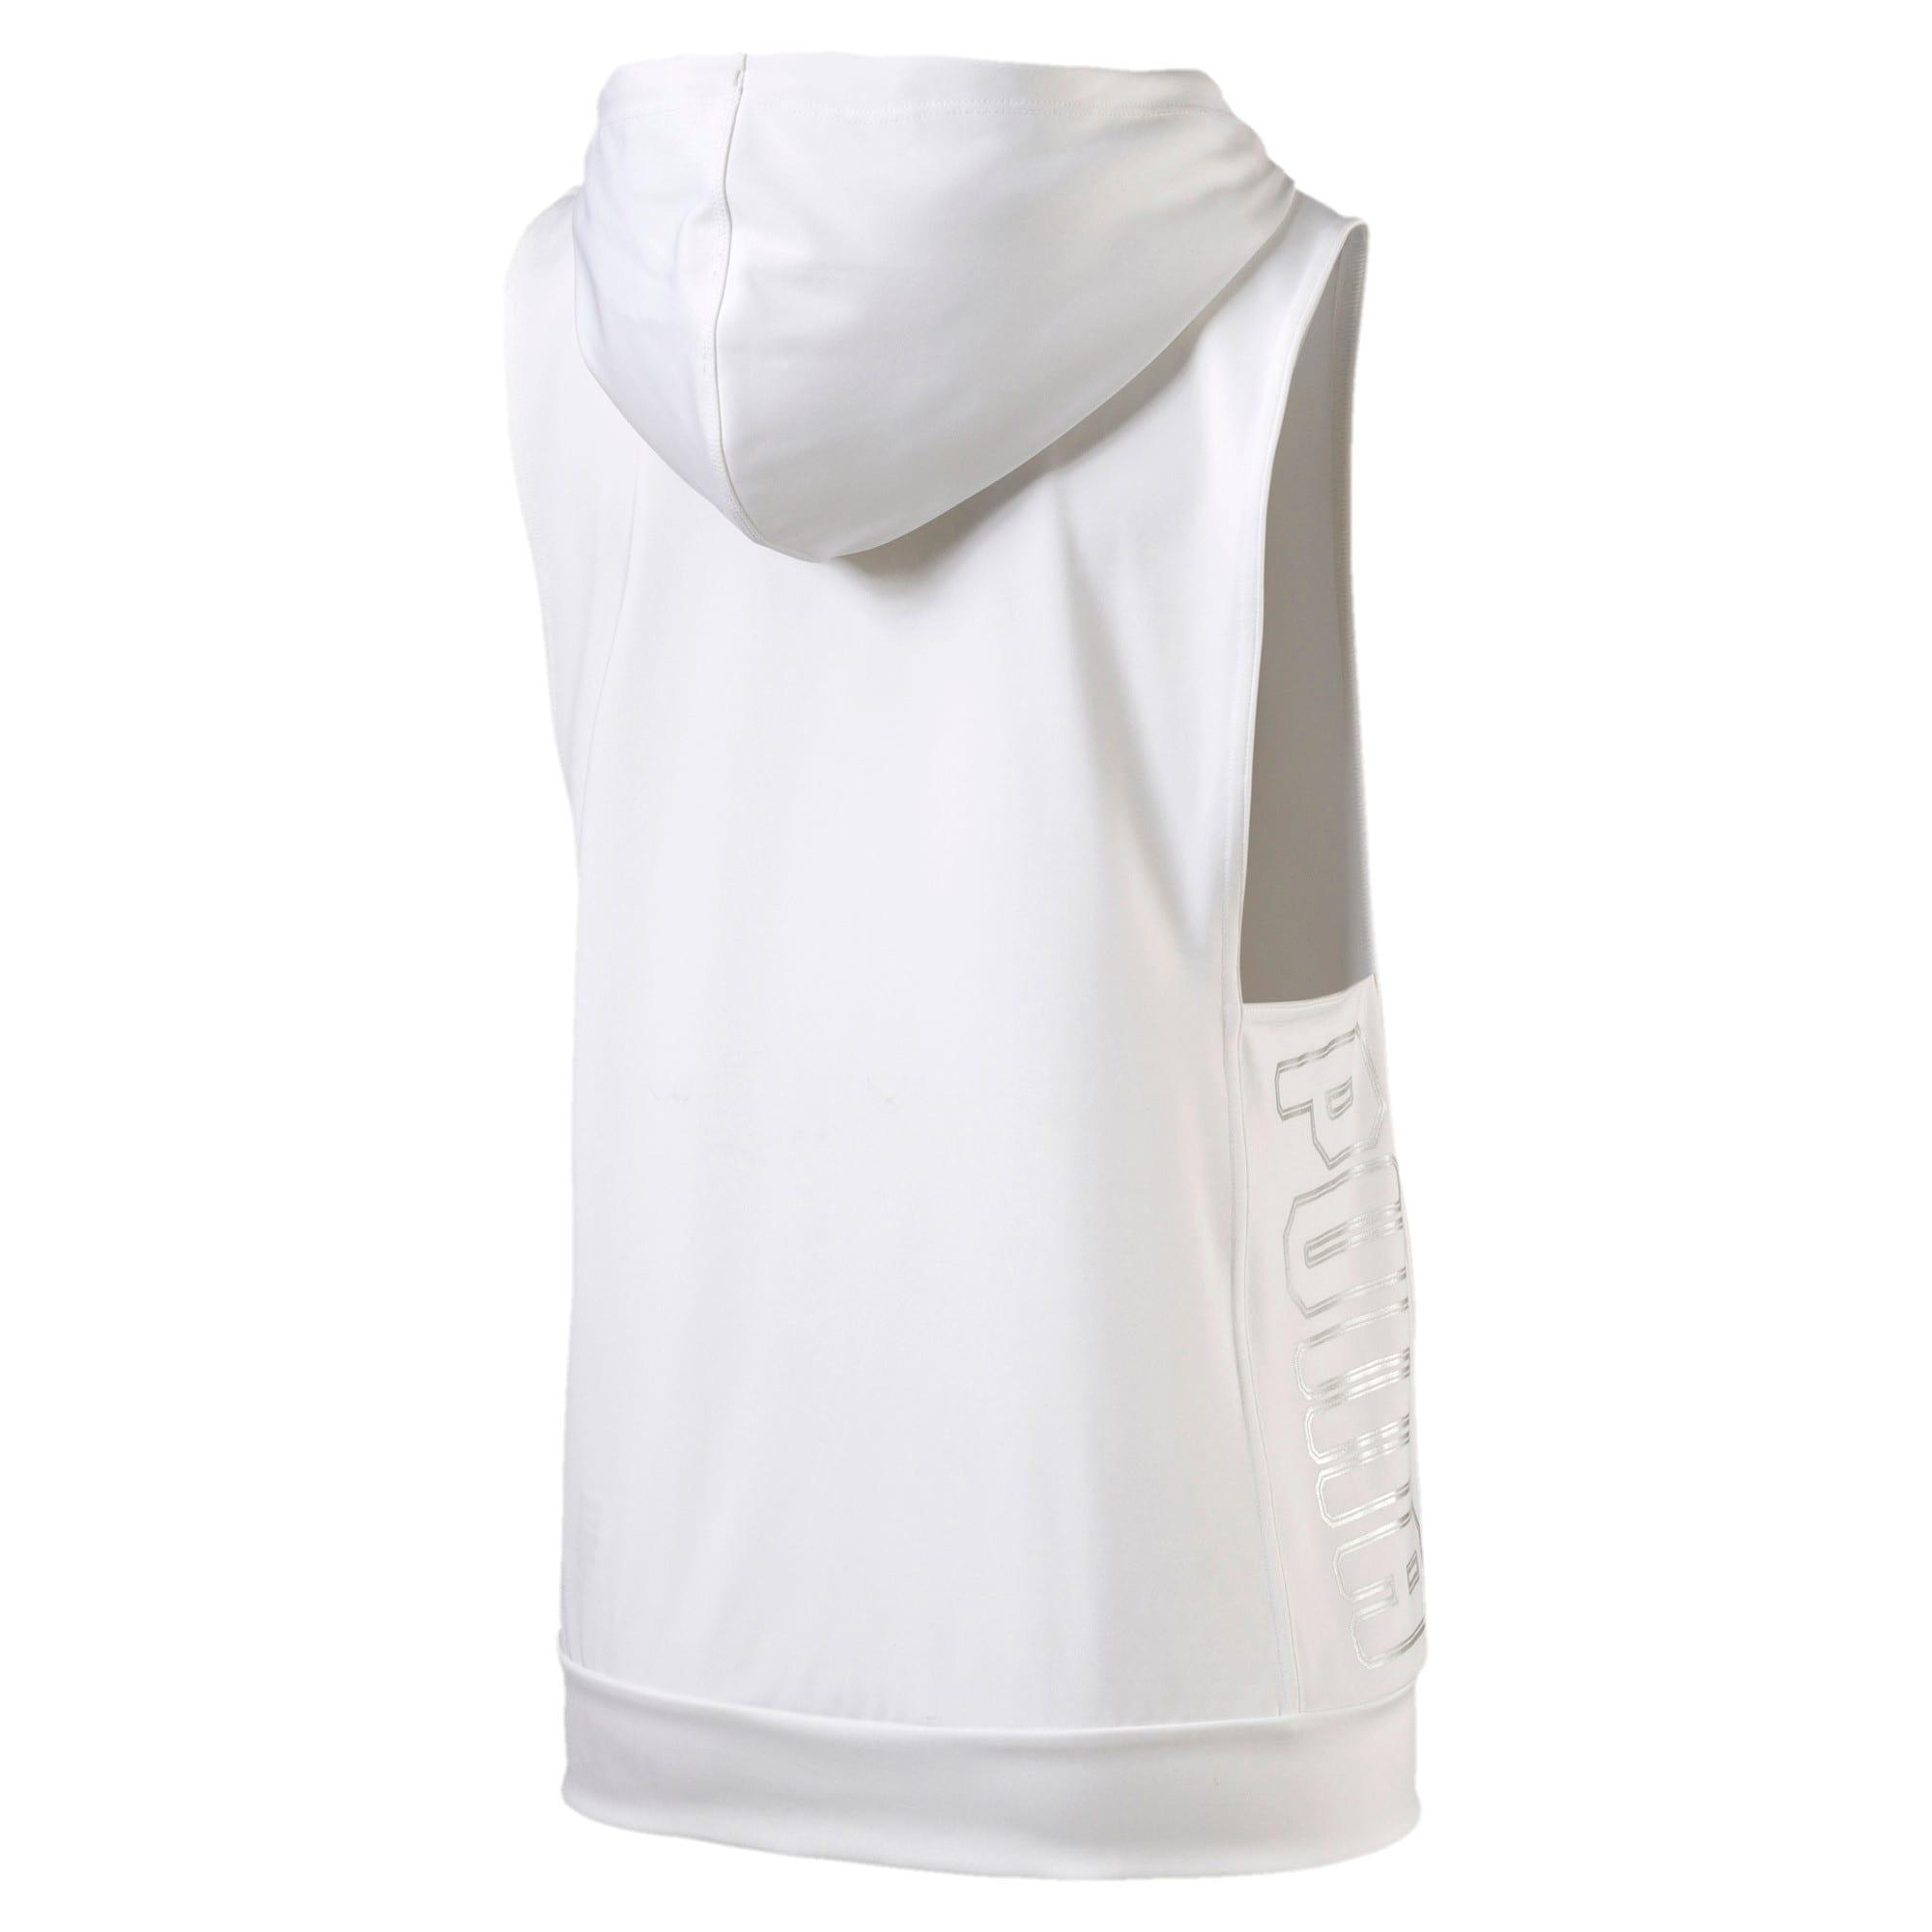 Thumbnail 2 of Clash Women's Vest, Puma White, medium-IND